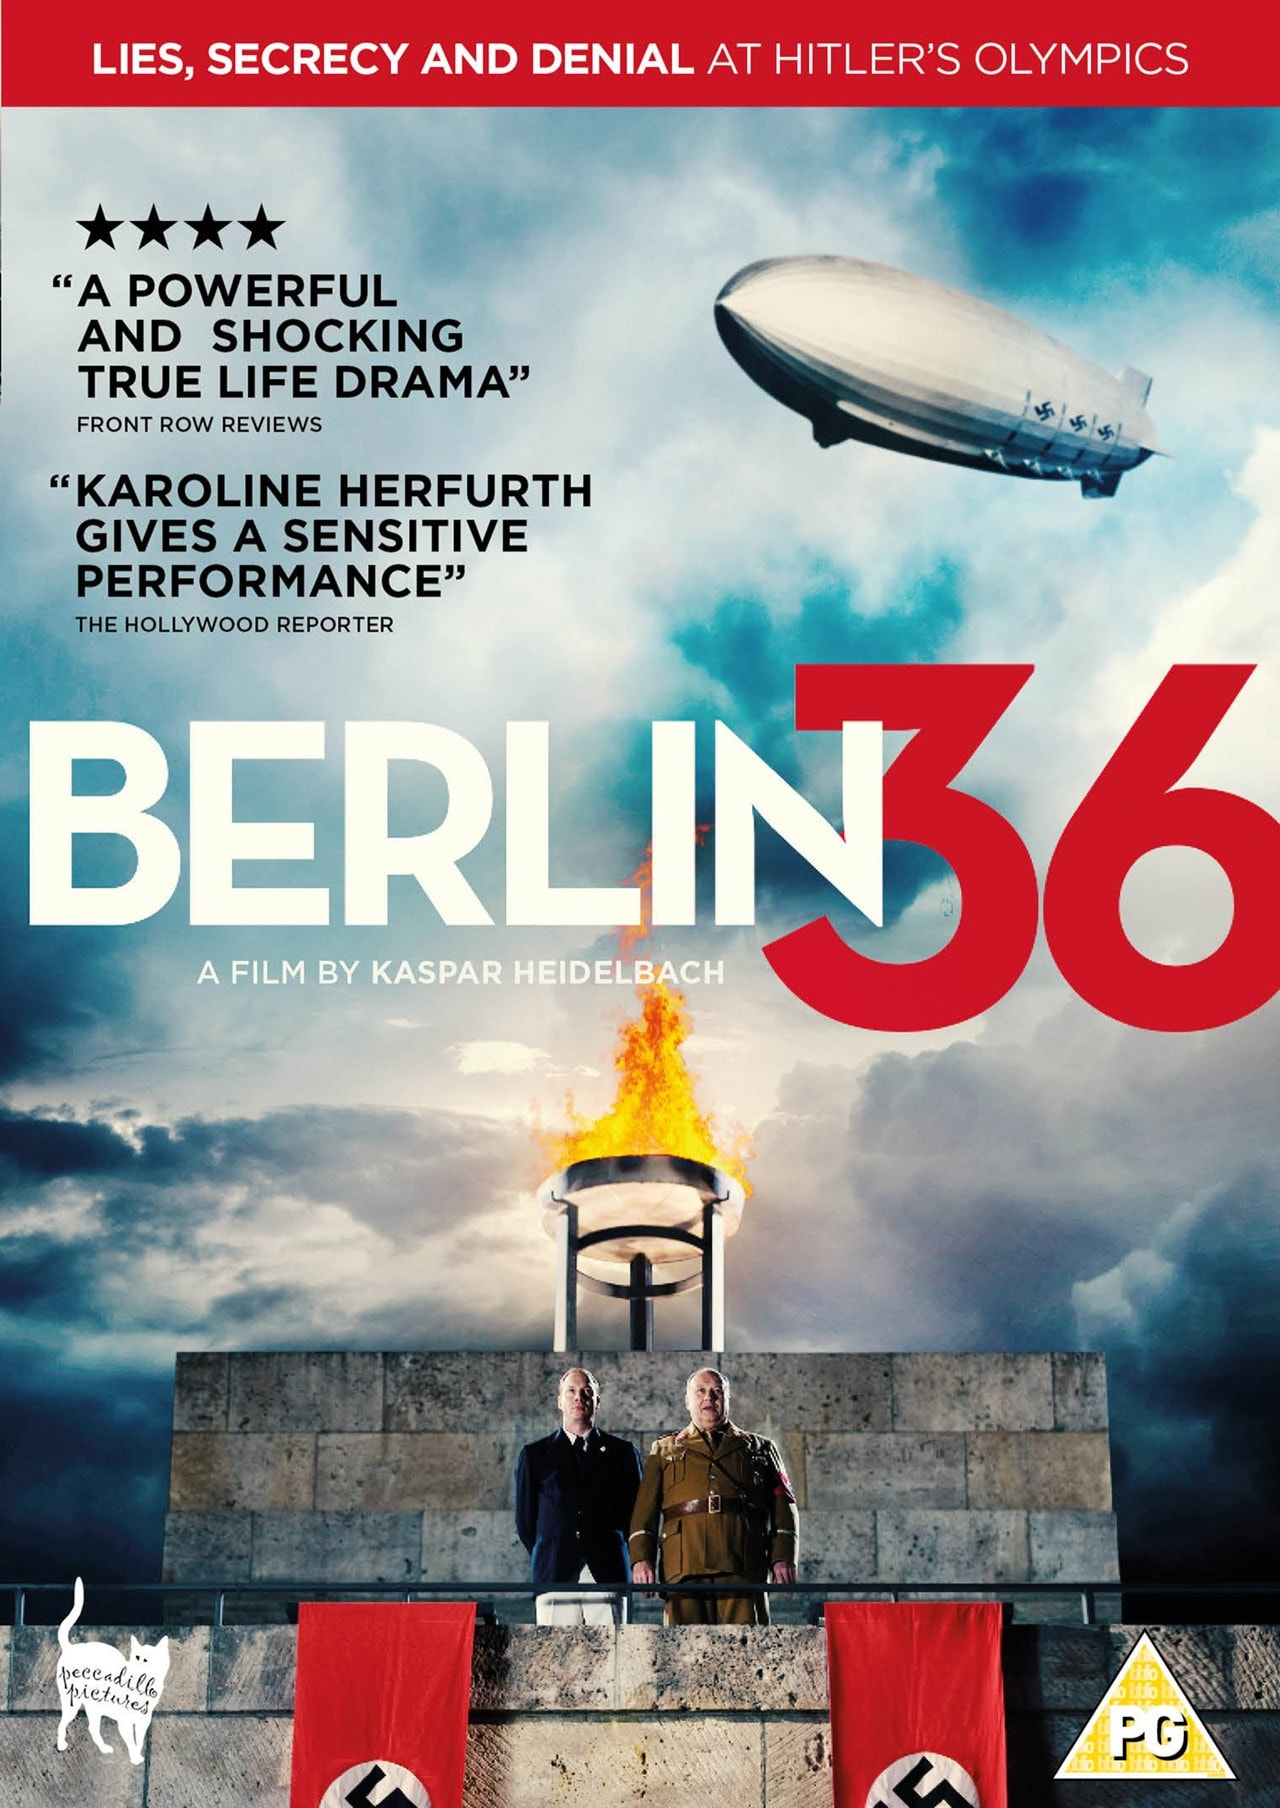 Berlin 36 - 1